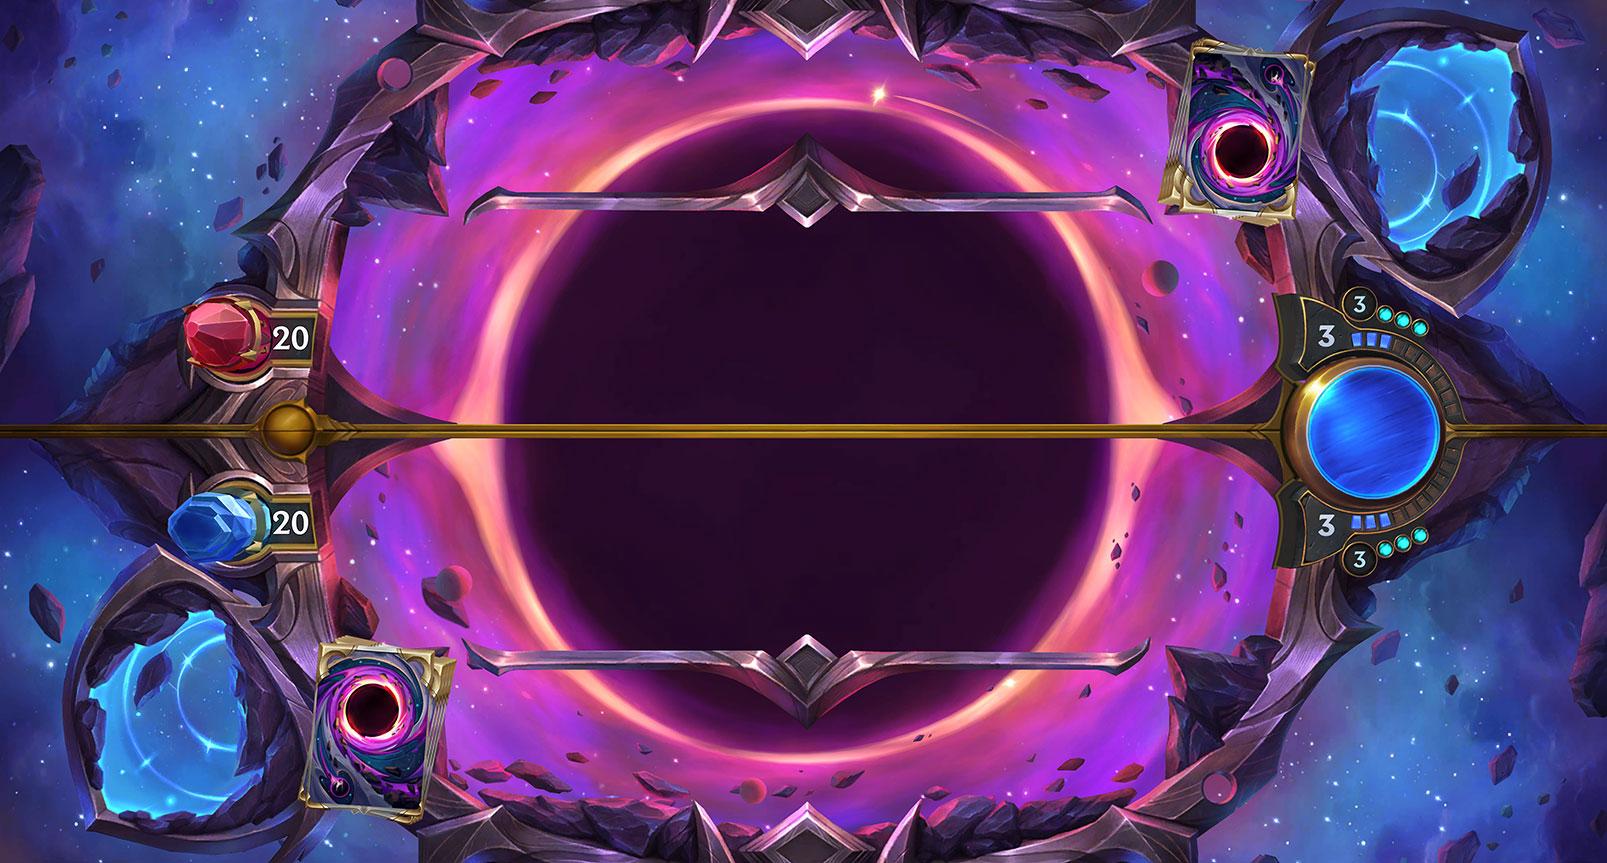 Dark_Horizon_Board1607x863.jpg